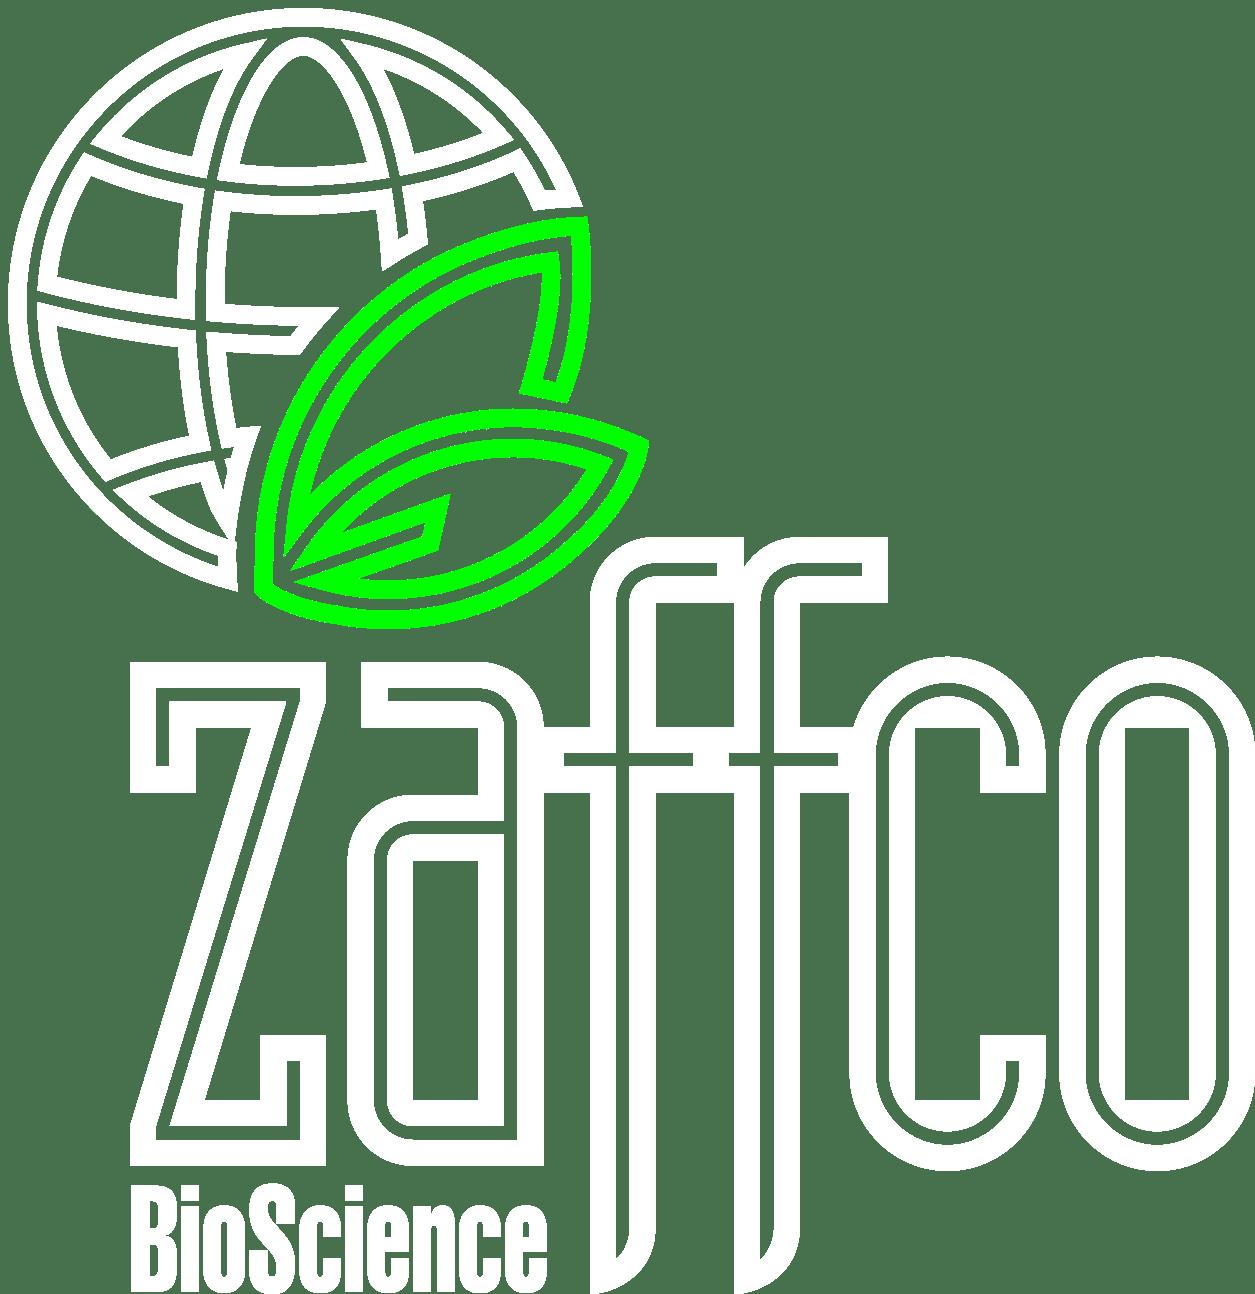 Zaffco